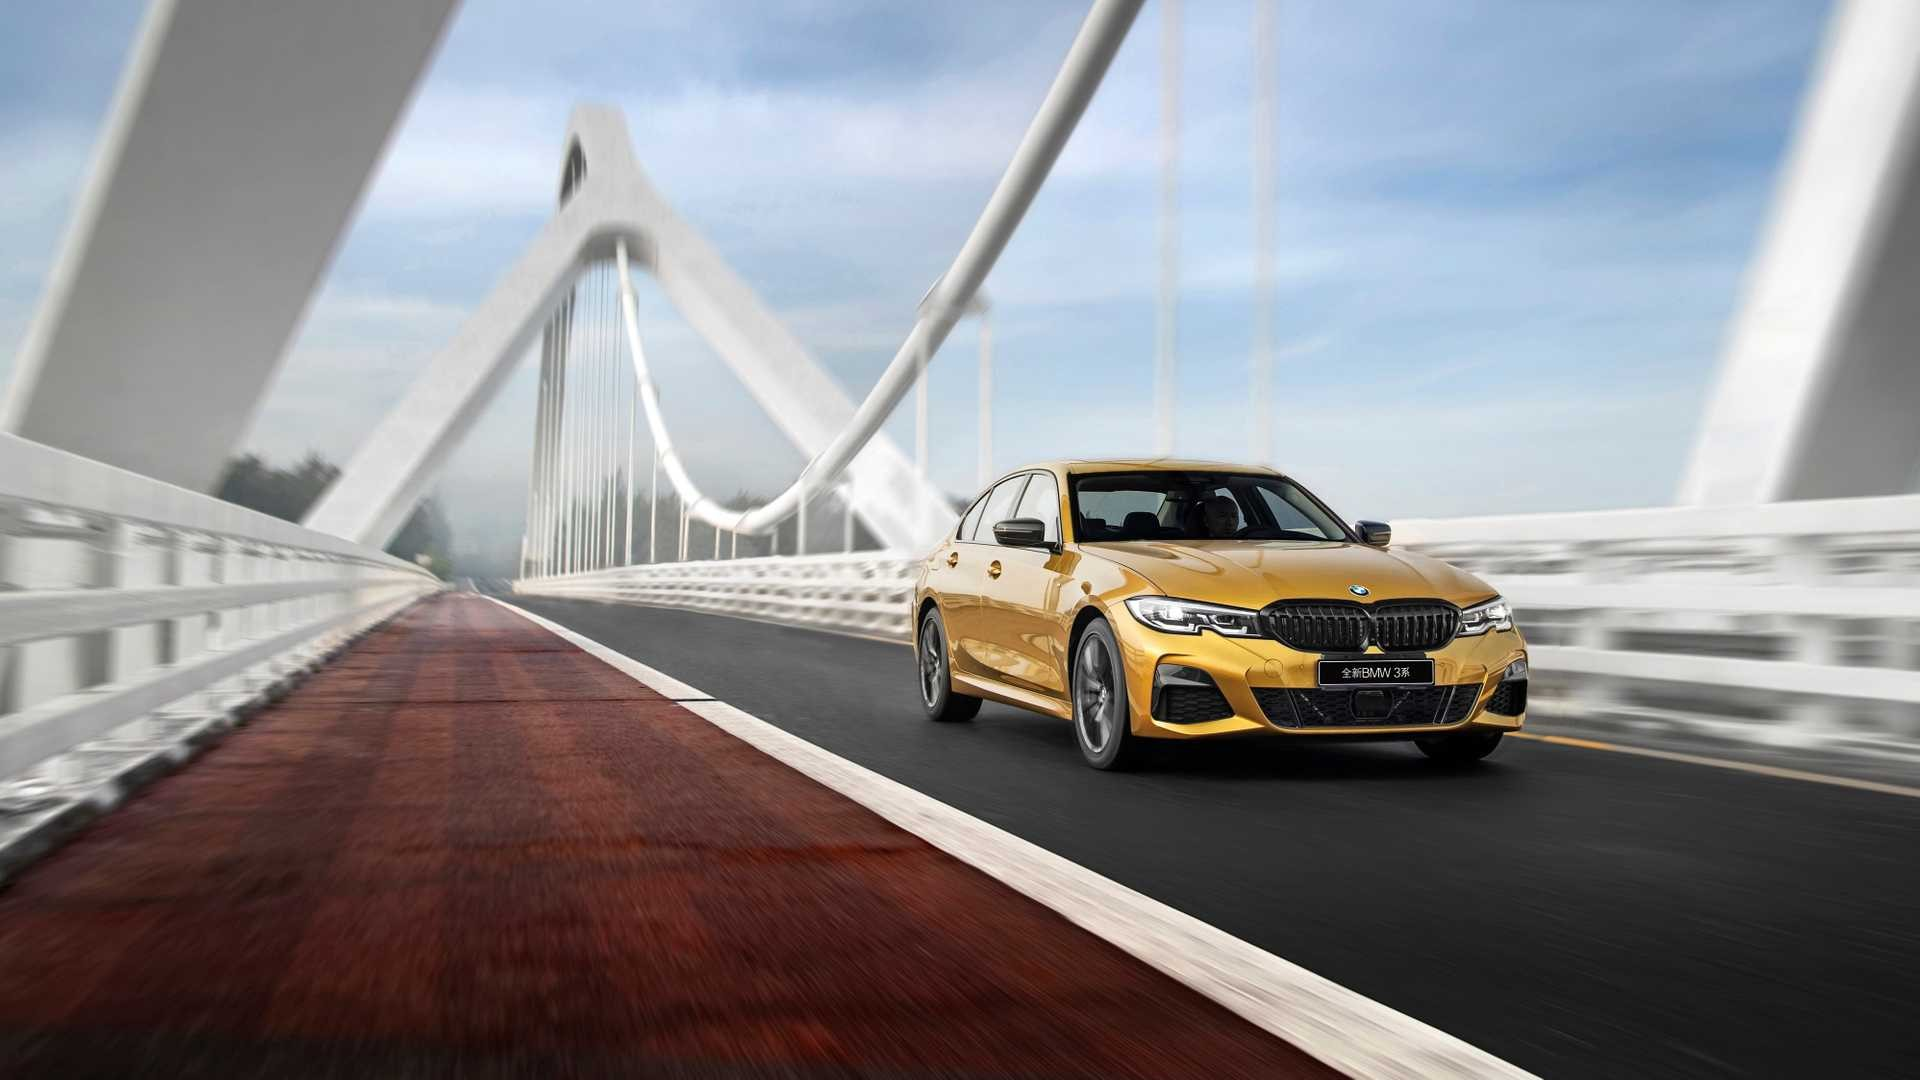 BMW-3-Series-LWB-Long-Wheelbase-2019-4